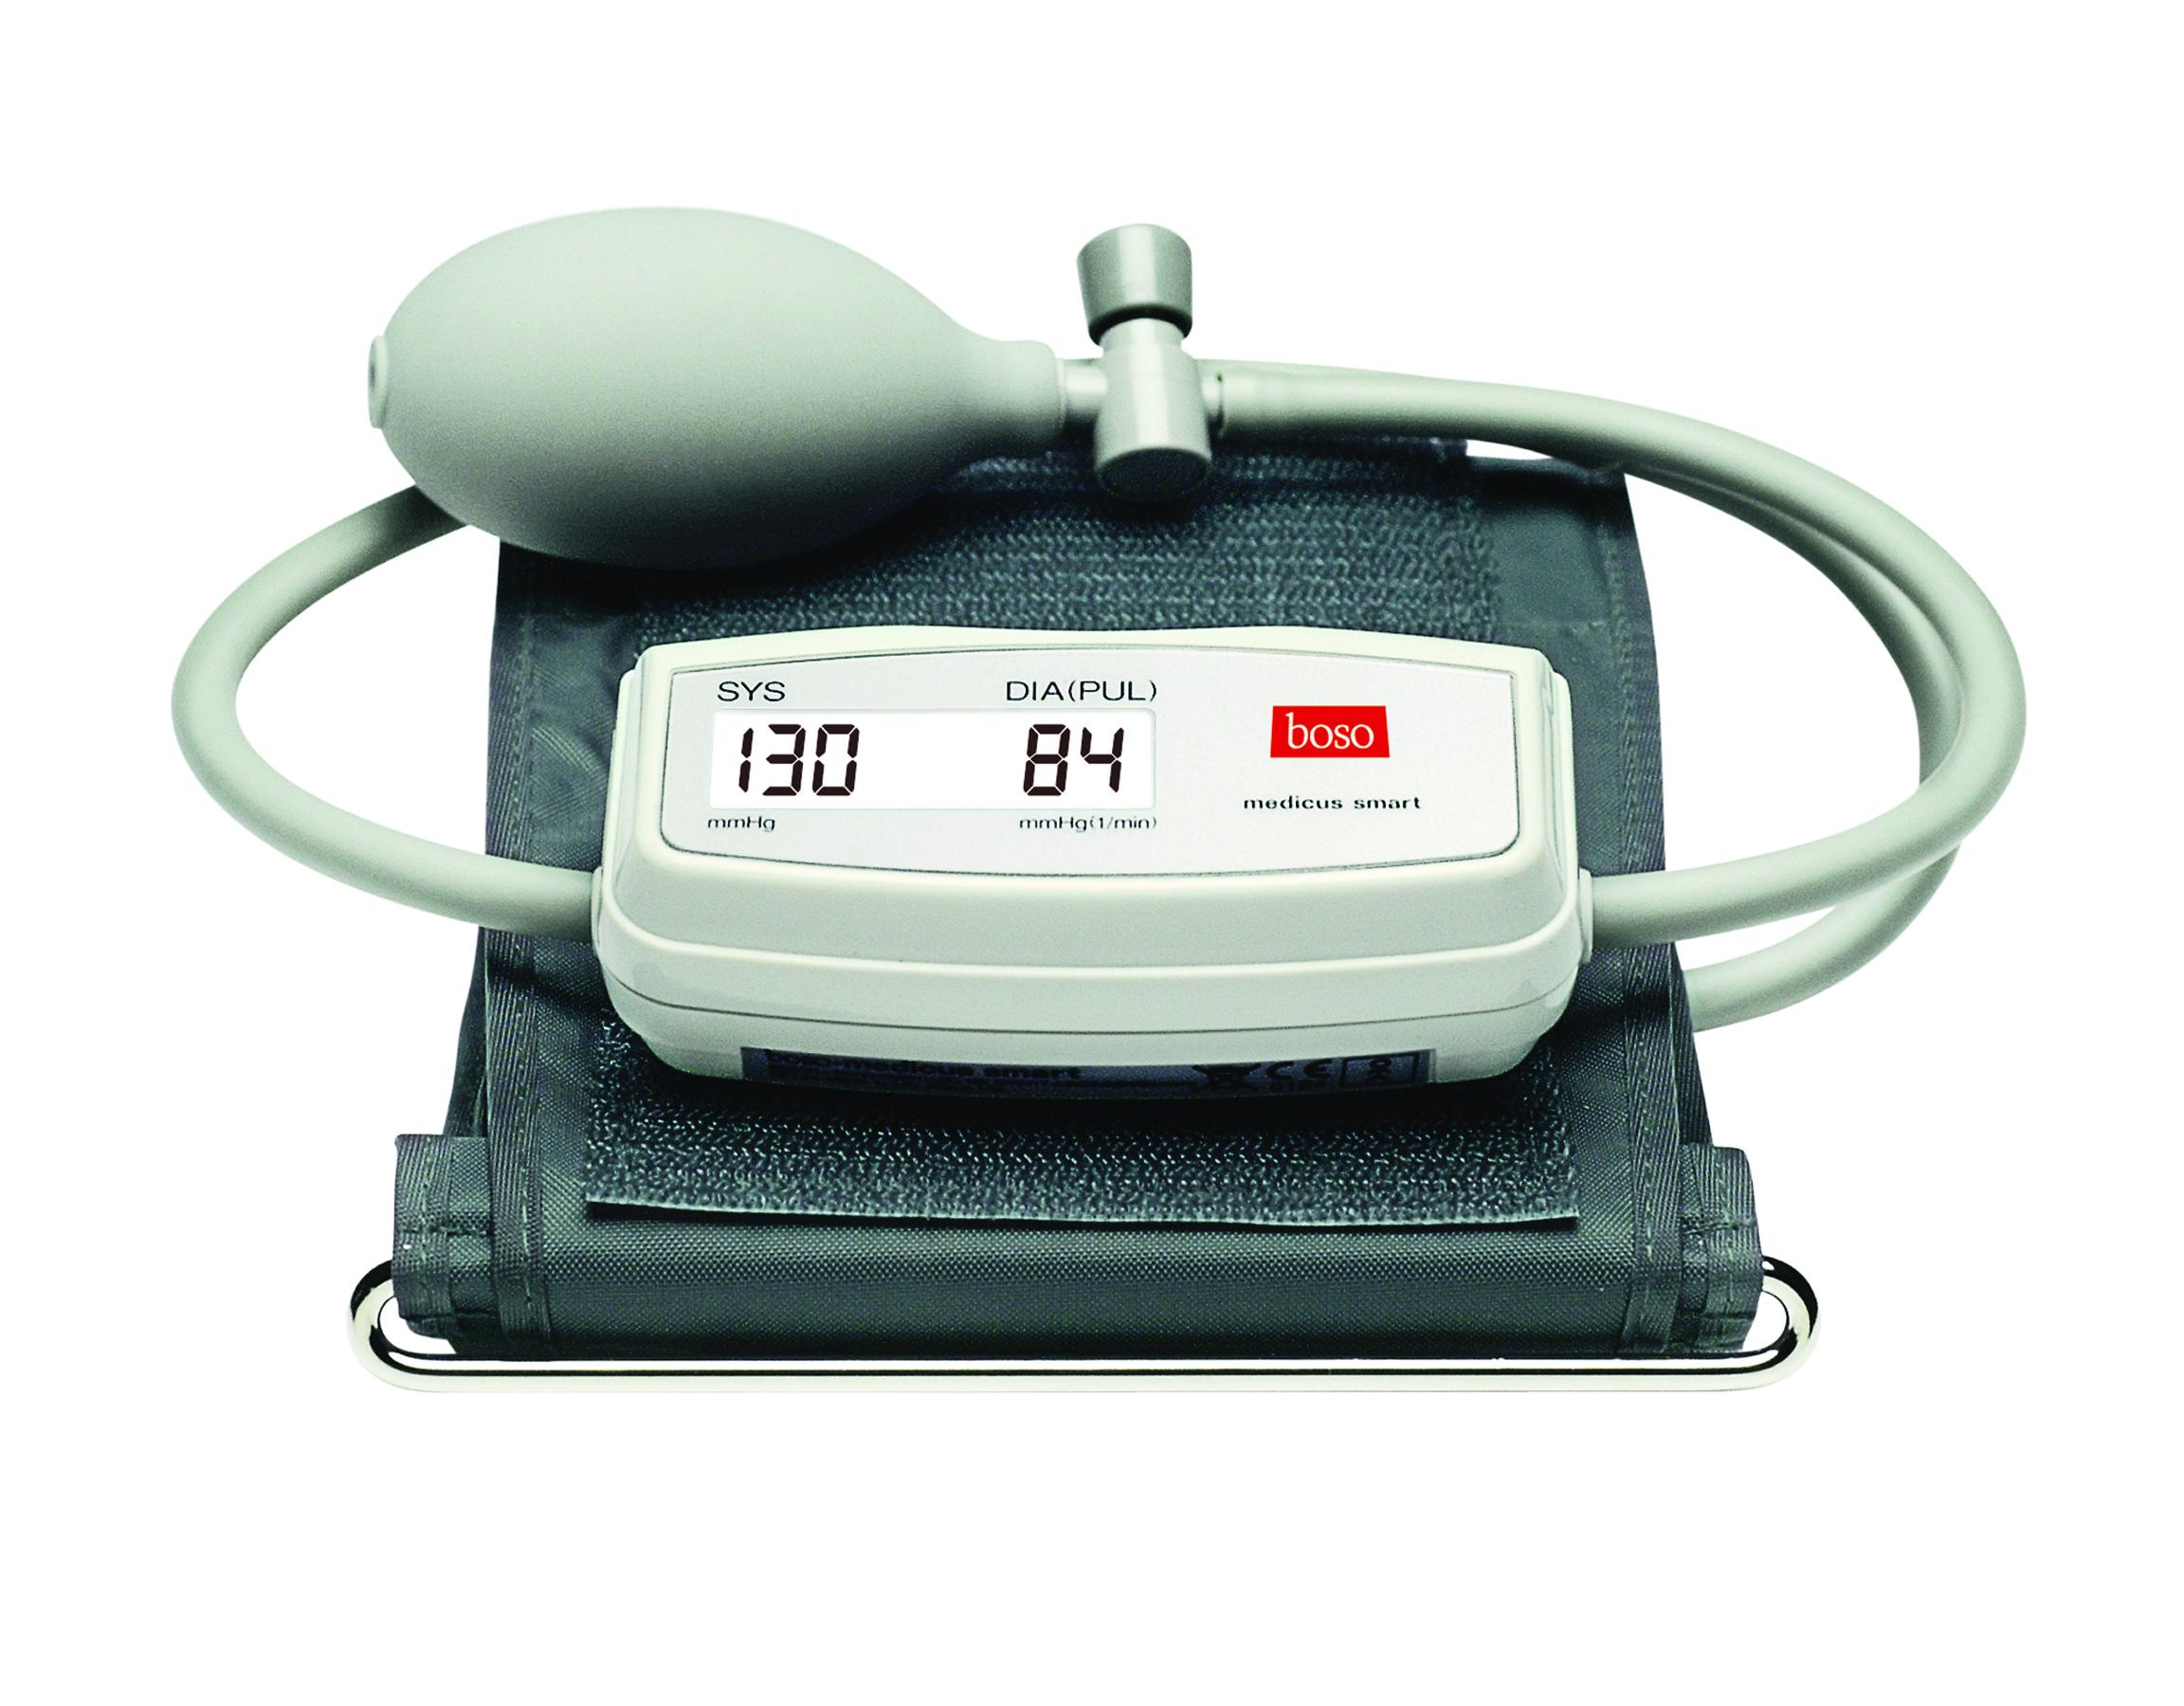 Boso medicus smart Blutdruckmessgerät